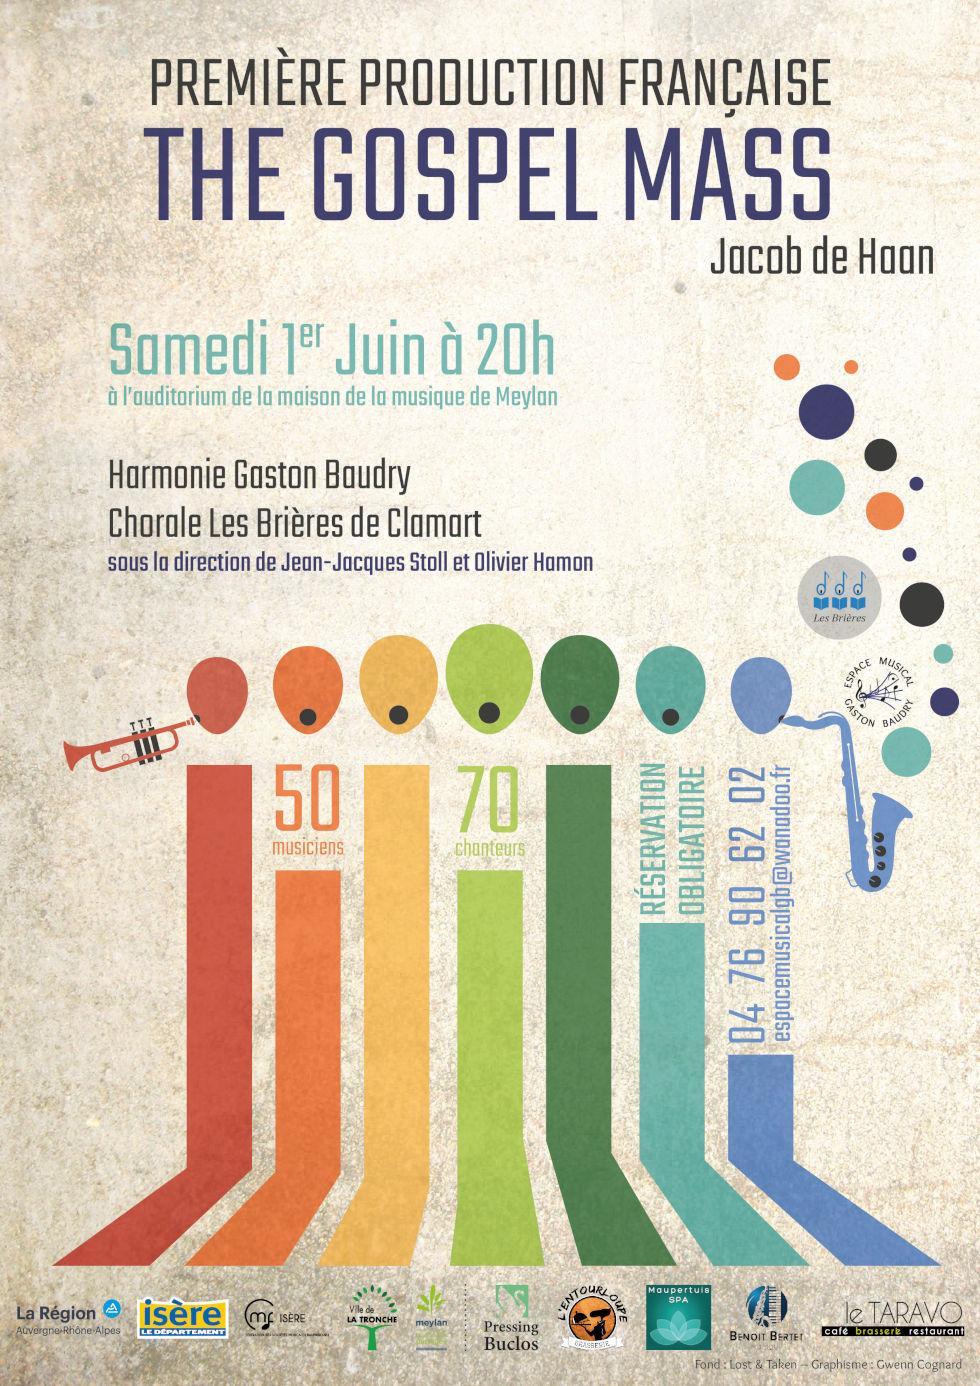 Concert Gospel Mass Harmonie Gaston Baudry